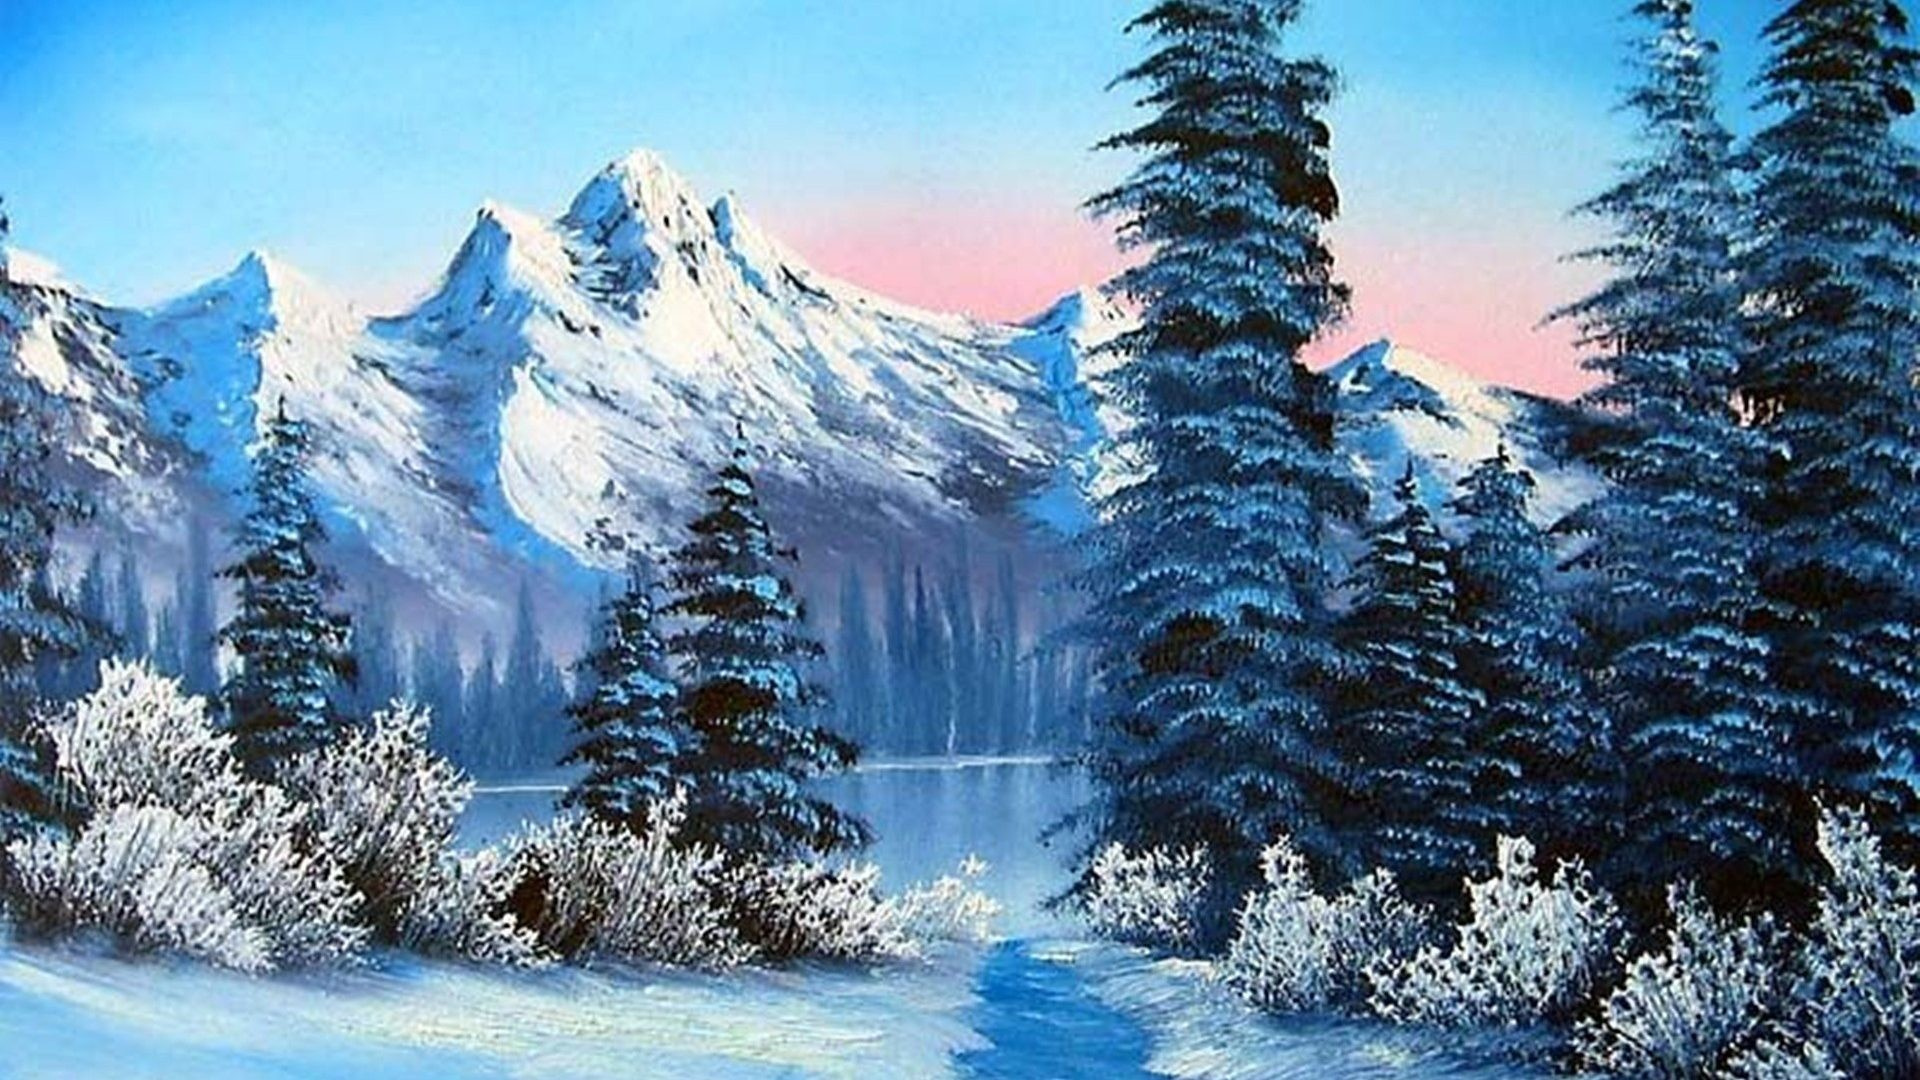 Winter Wonderland wallpaper ·① Download free stunning ...